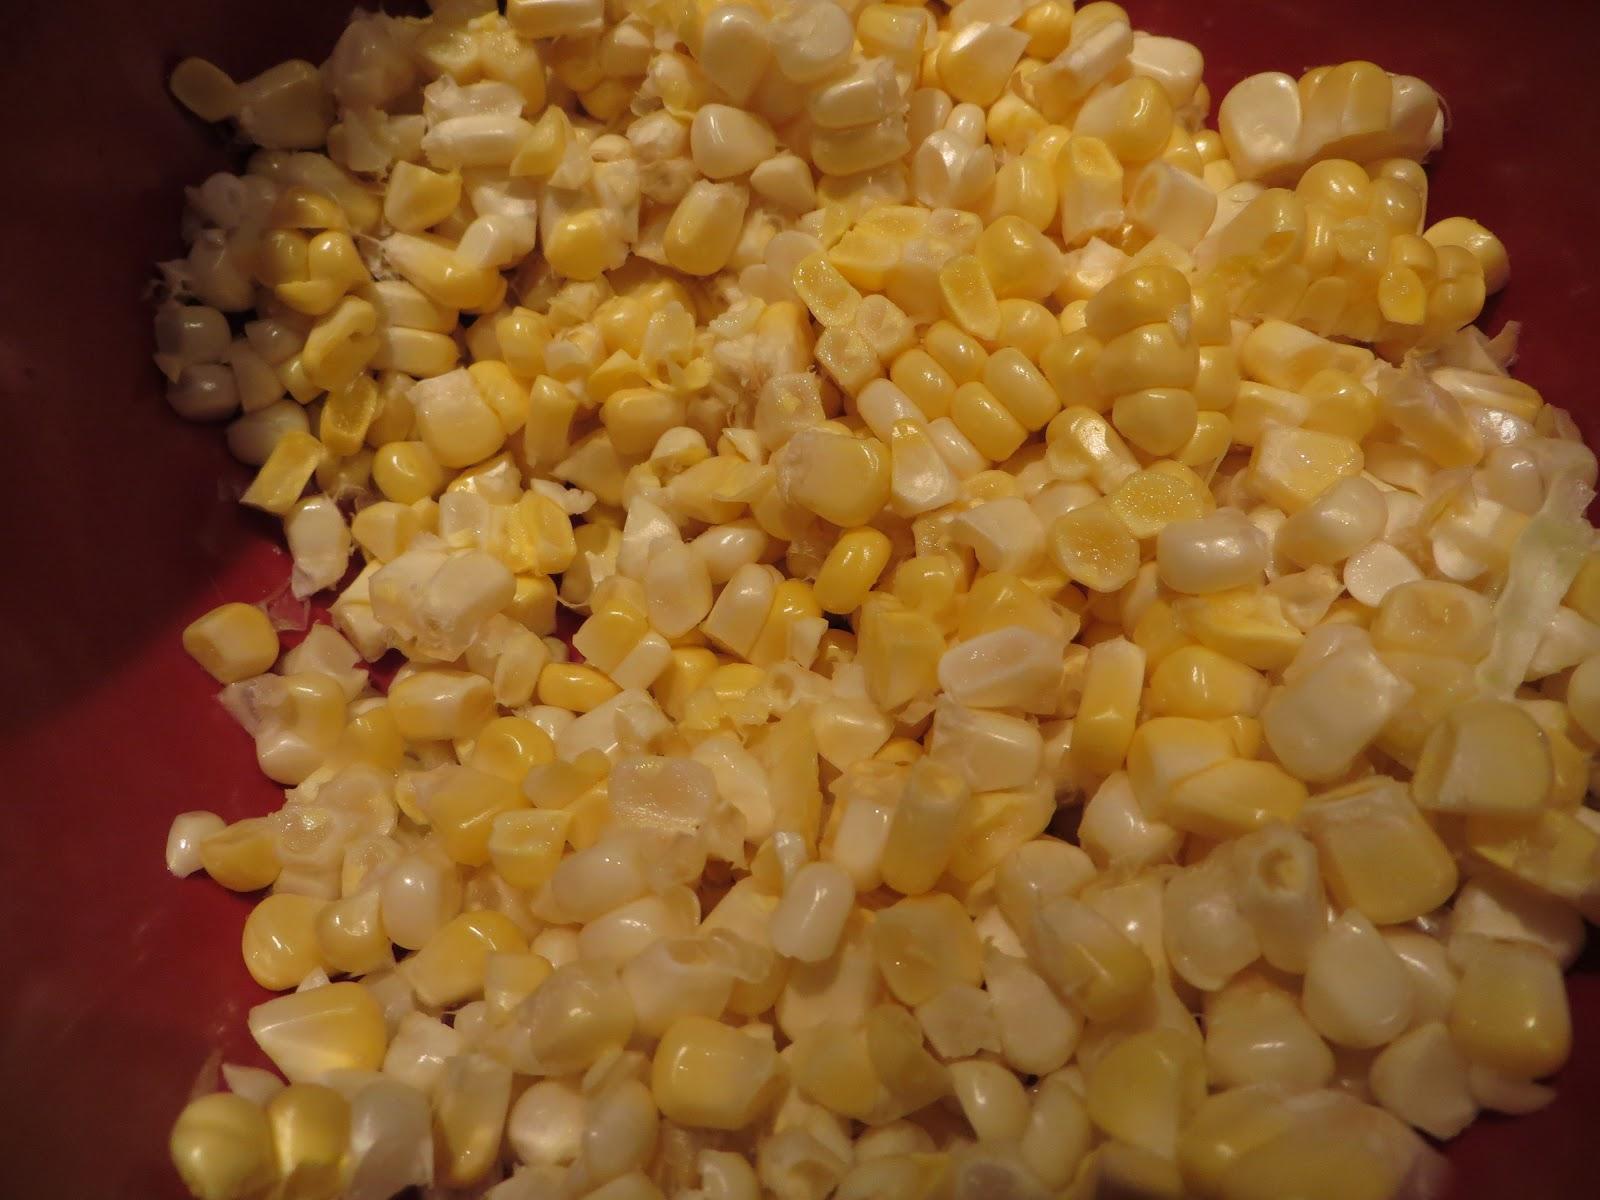 gastronomic nomad: Creamy Harissa-Corn Soup